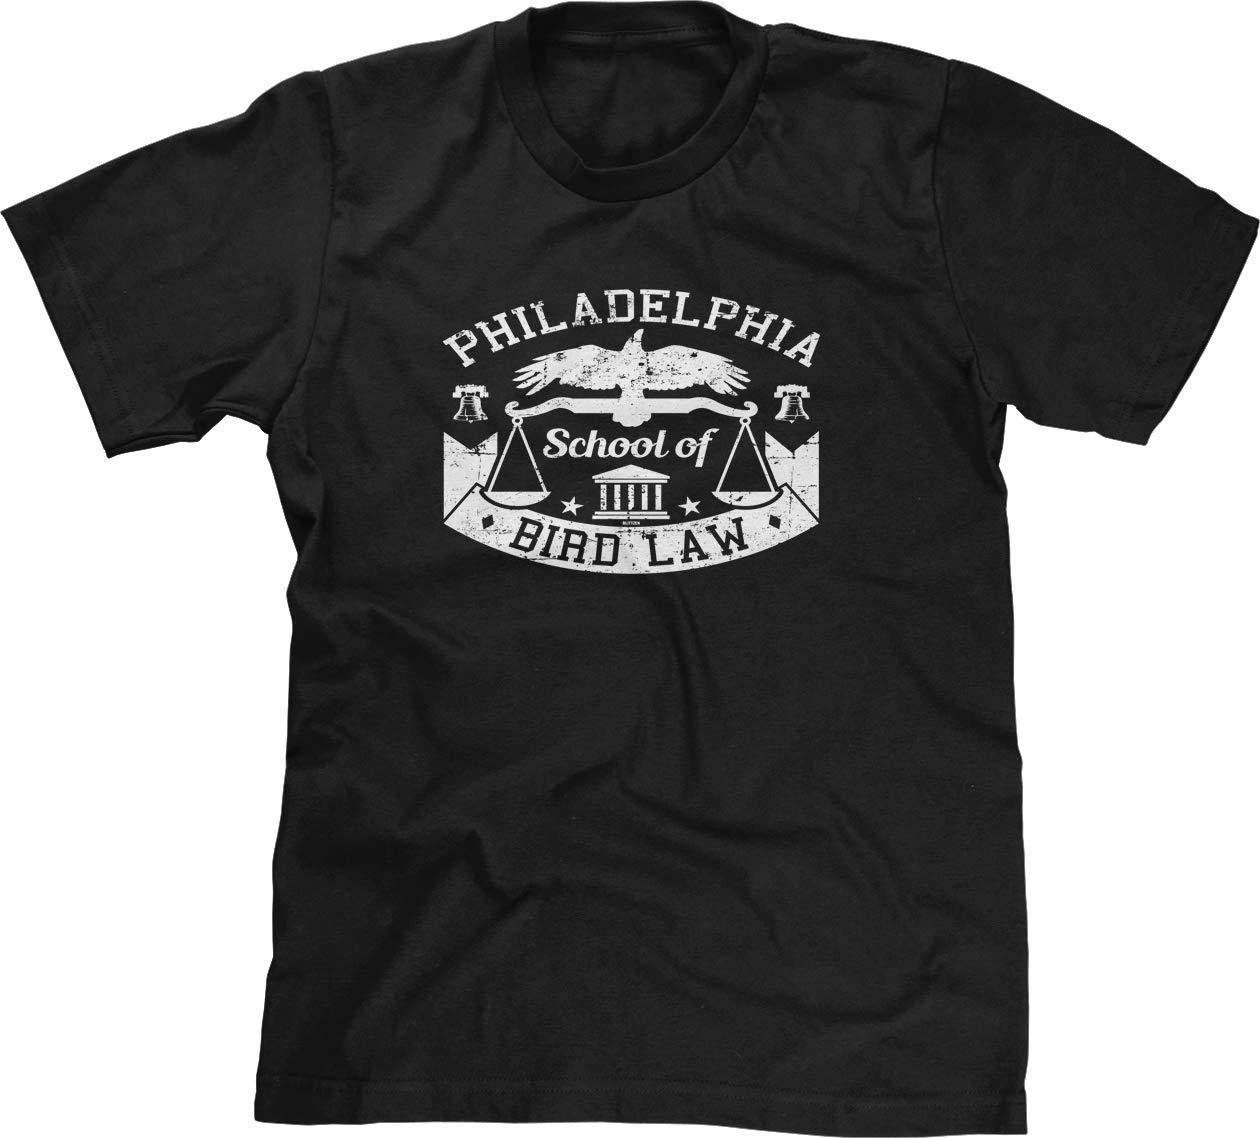 S Tshirt Philadelphia School Of Bird Law